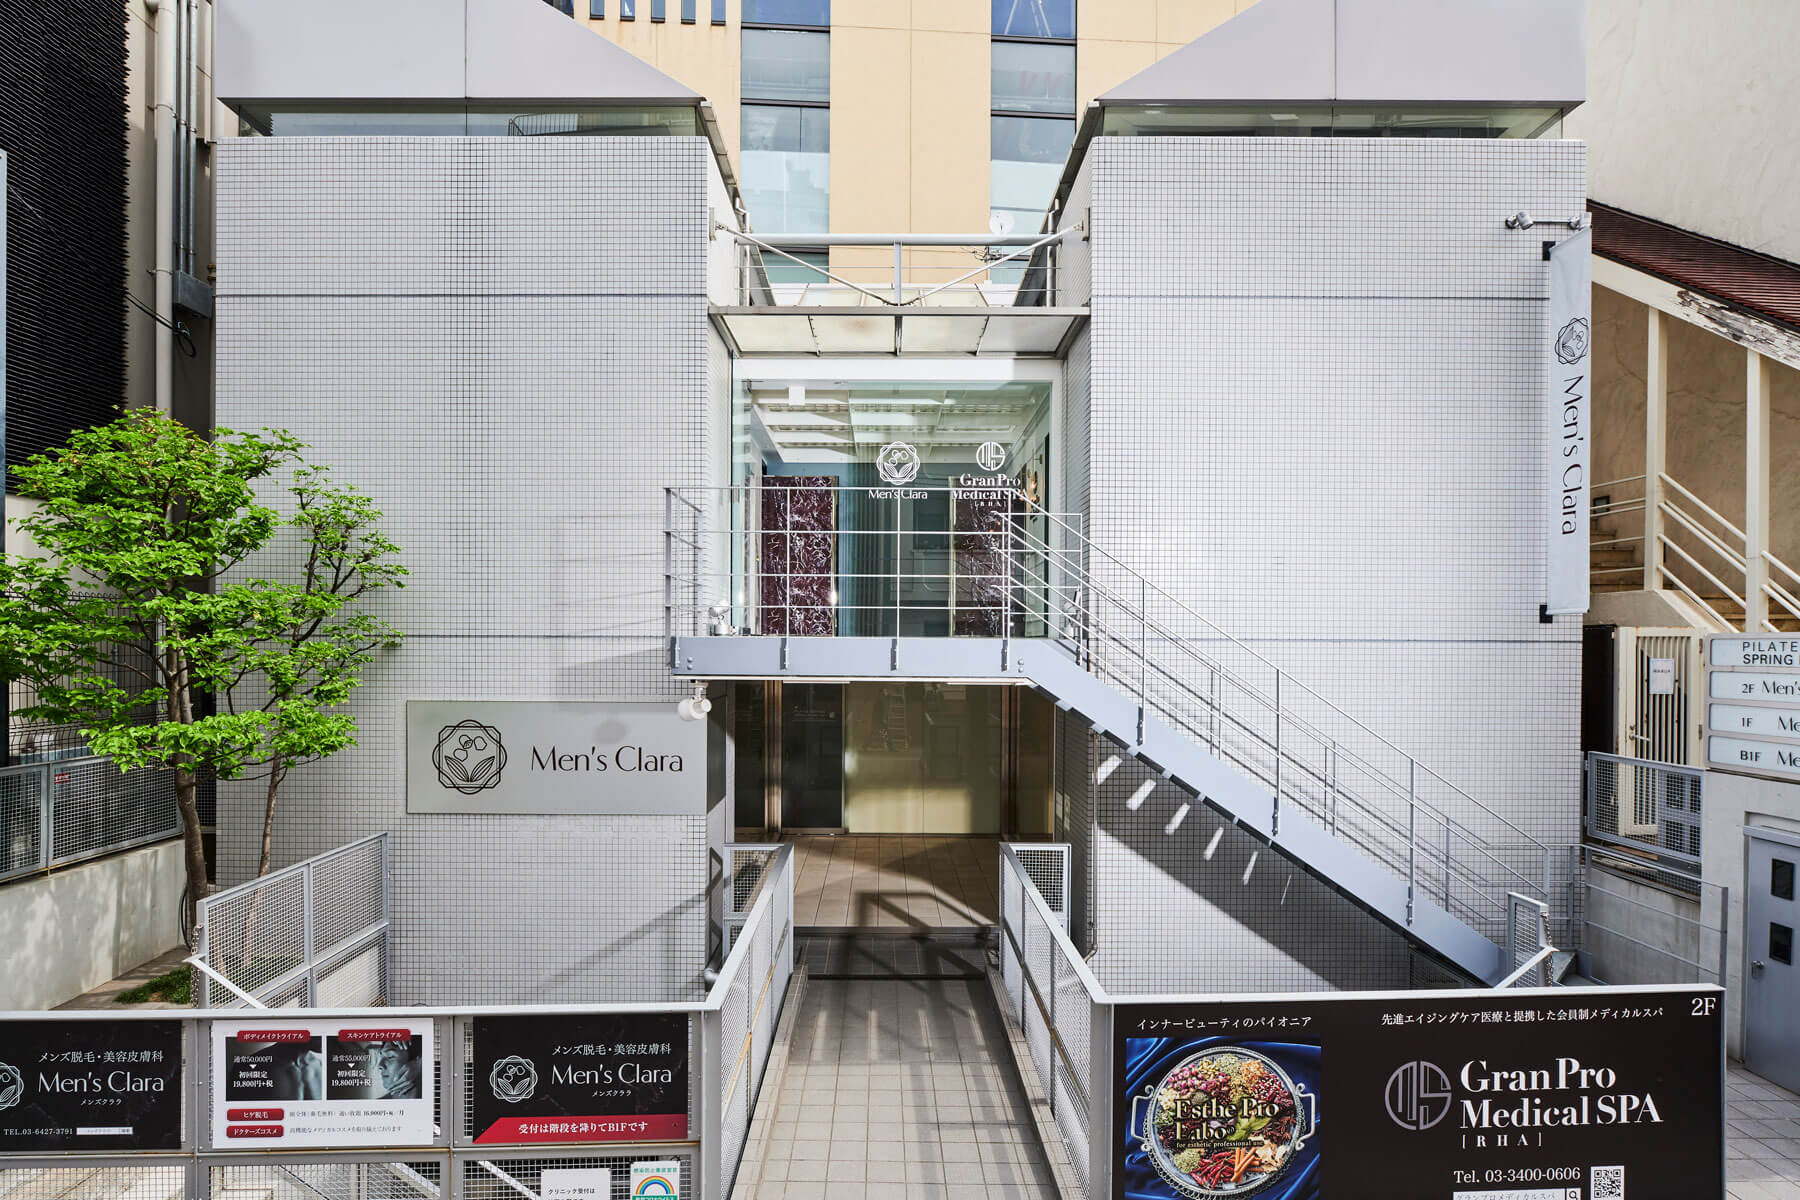 GranPro Medical SPA/Tokyo